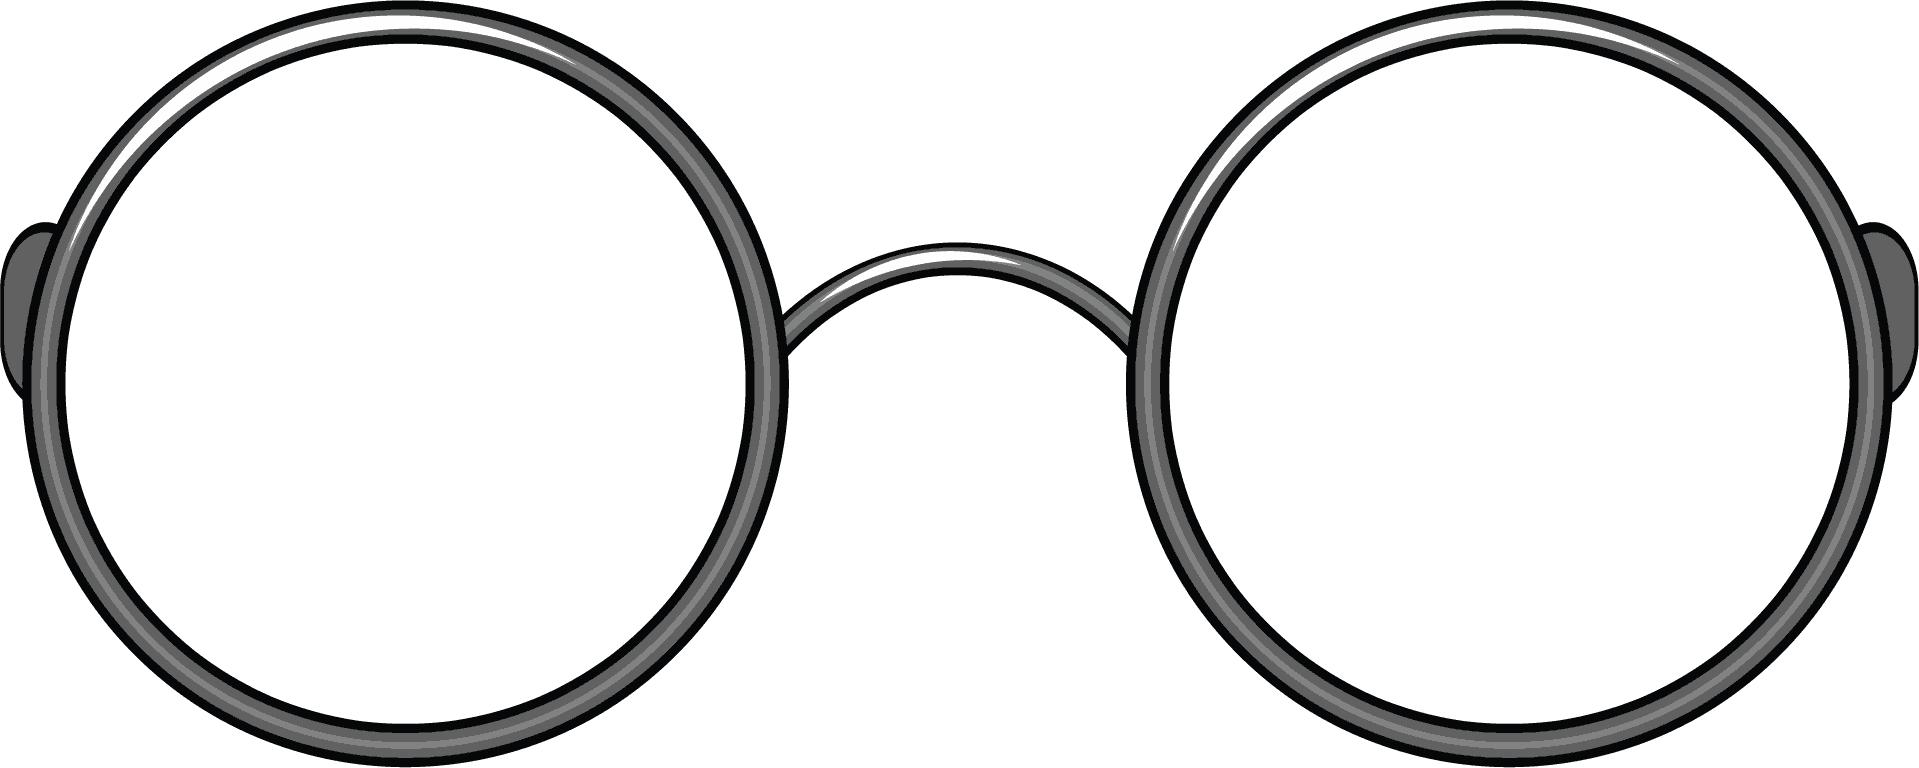 Glasses Clip Art Images Free .